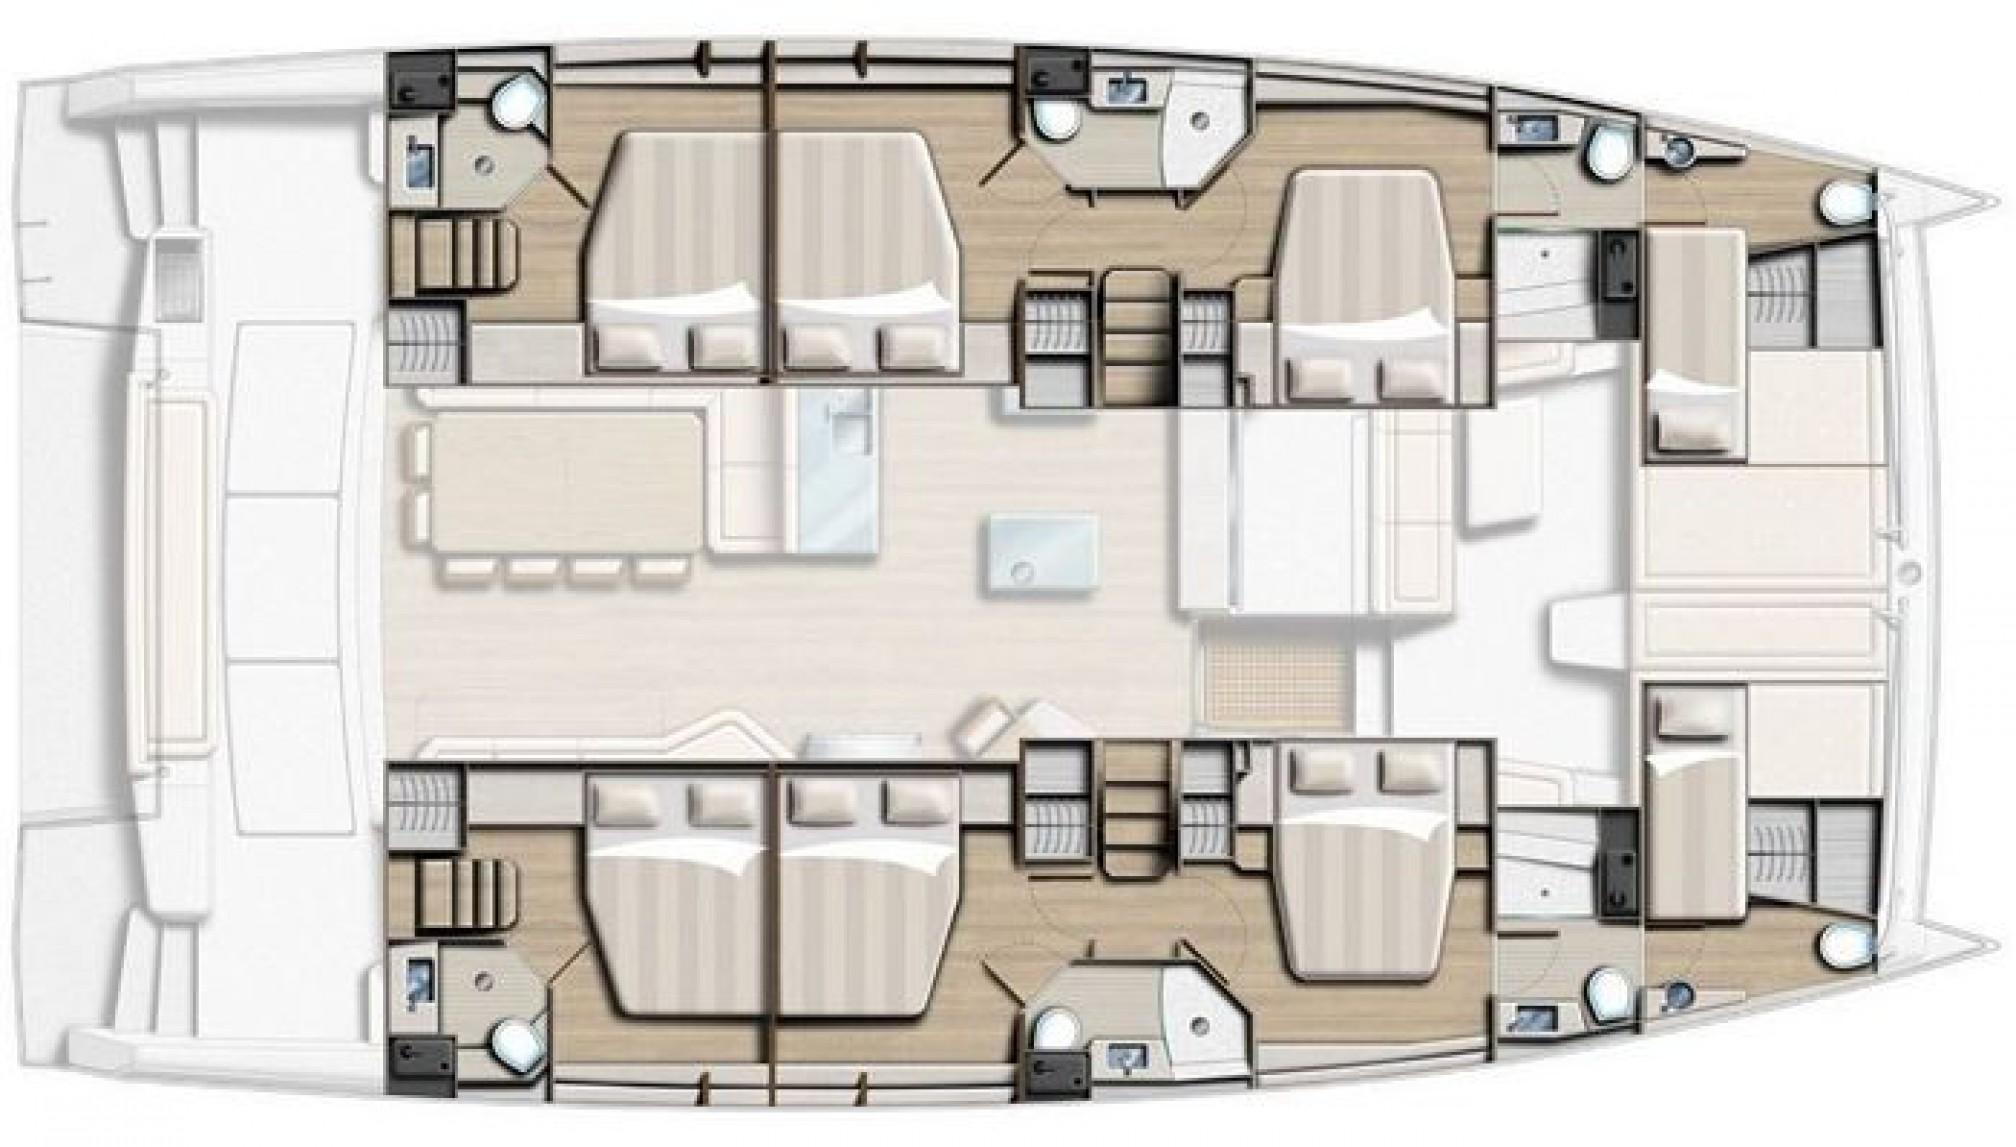 Rental catamaran Bali 5.4 (6 + 2 cab) layout